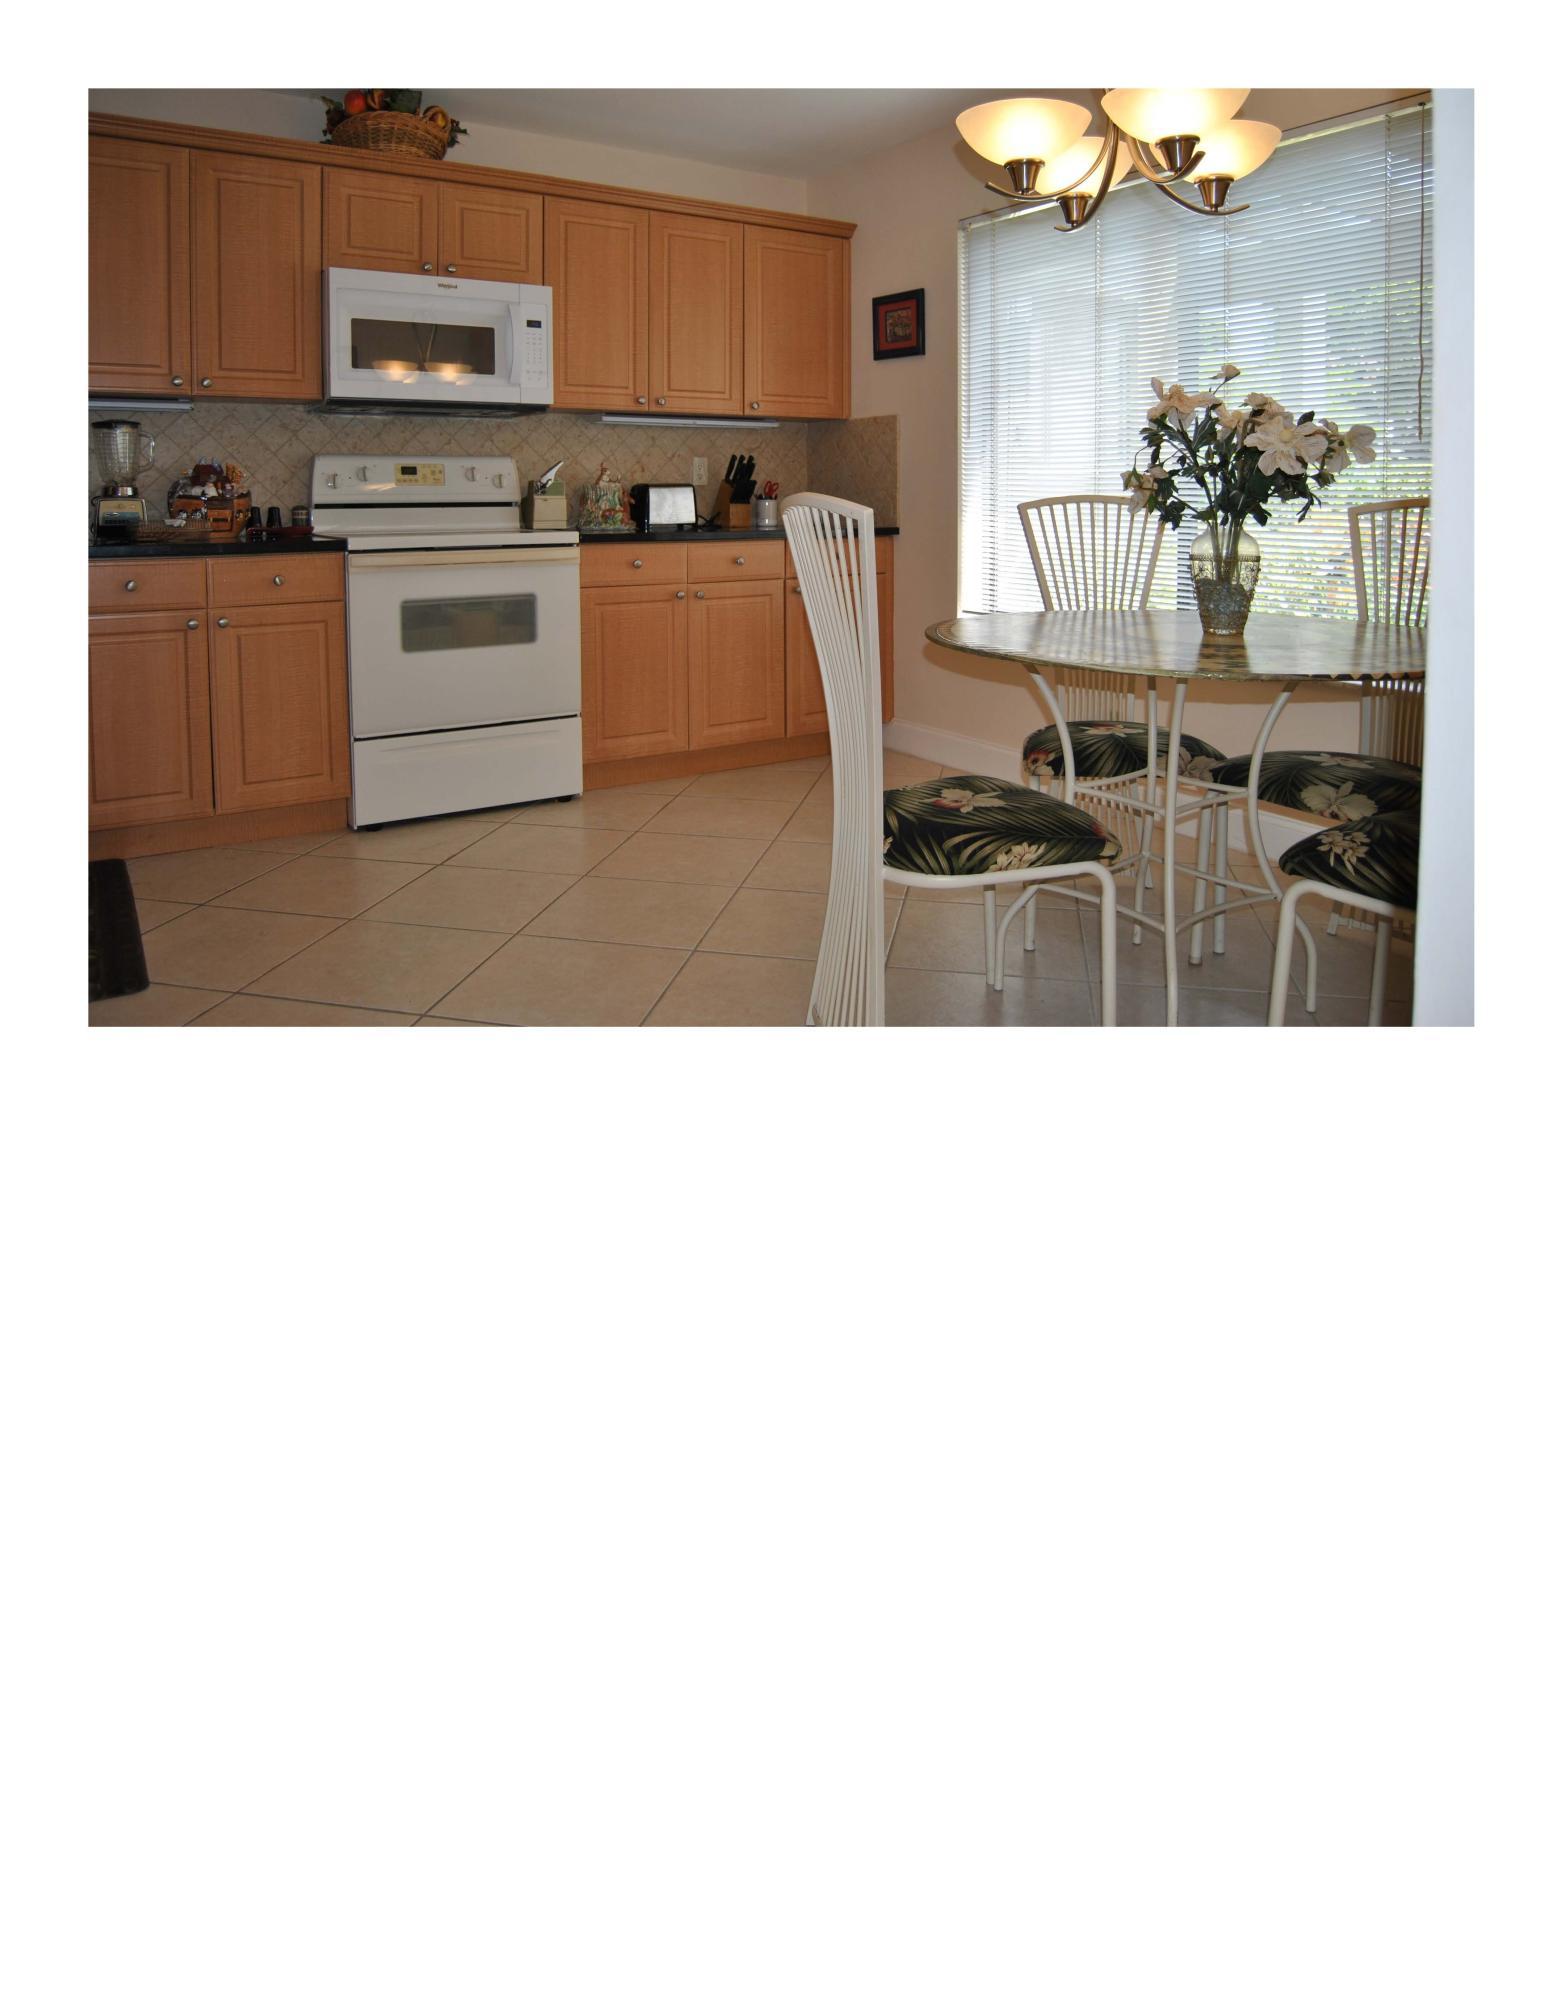 5757 Fairway Park Court 103 Boynton Beach, FL 33437 photo 2